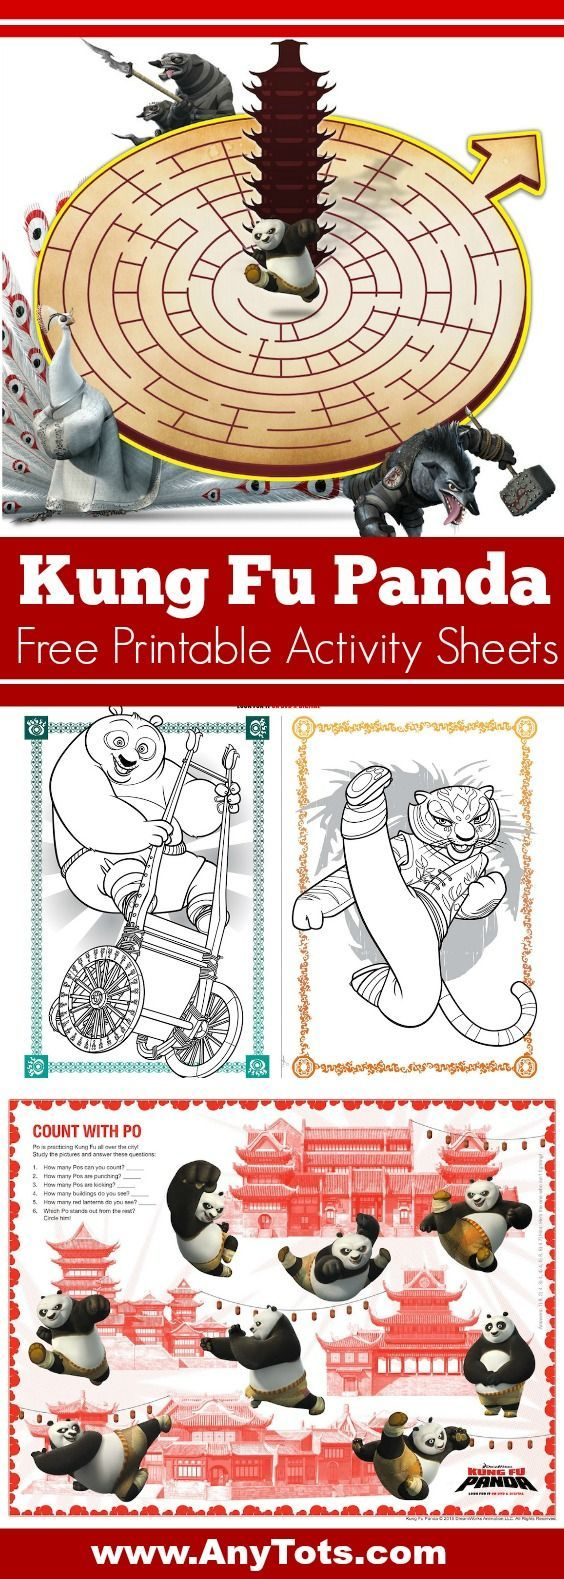 11 best Free Stuff Kids Table images on Pinterest   Pets, Secret ...